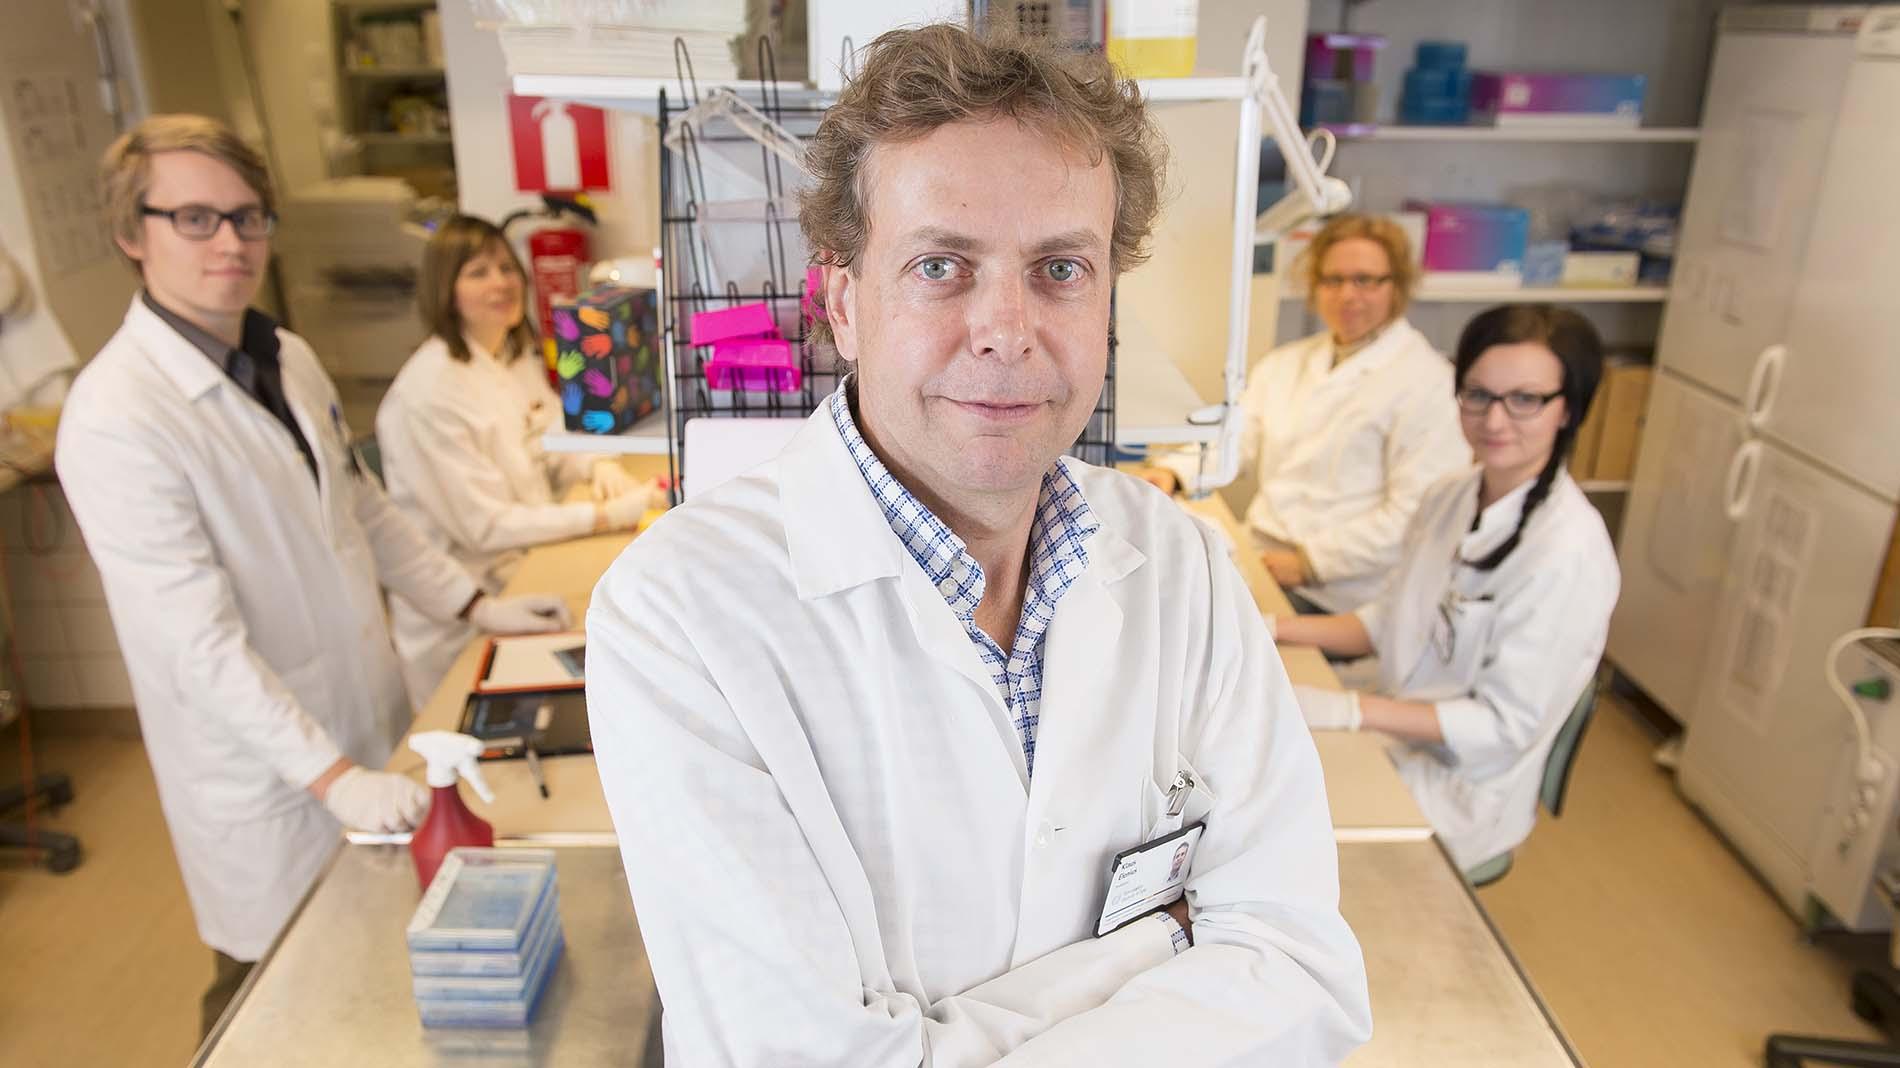 Tutkimusmatkalla: Professori Klaus Elenius